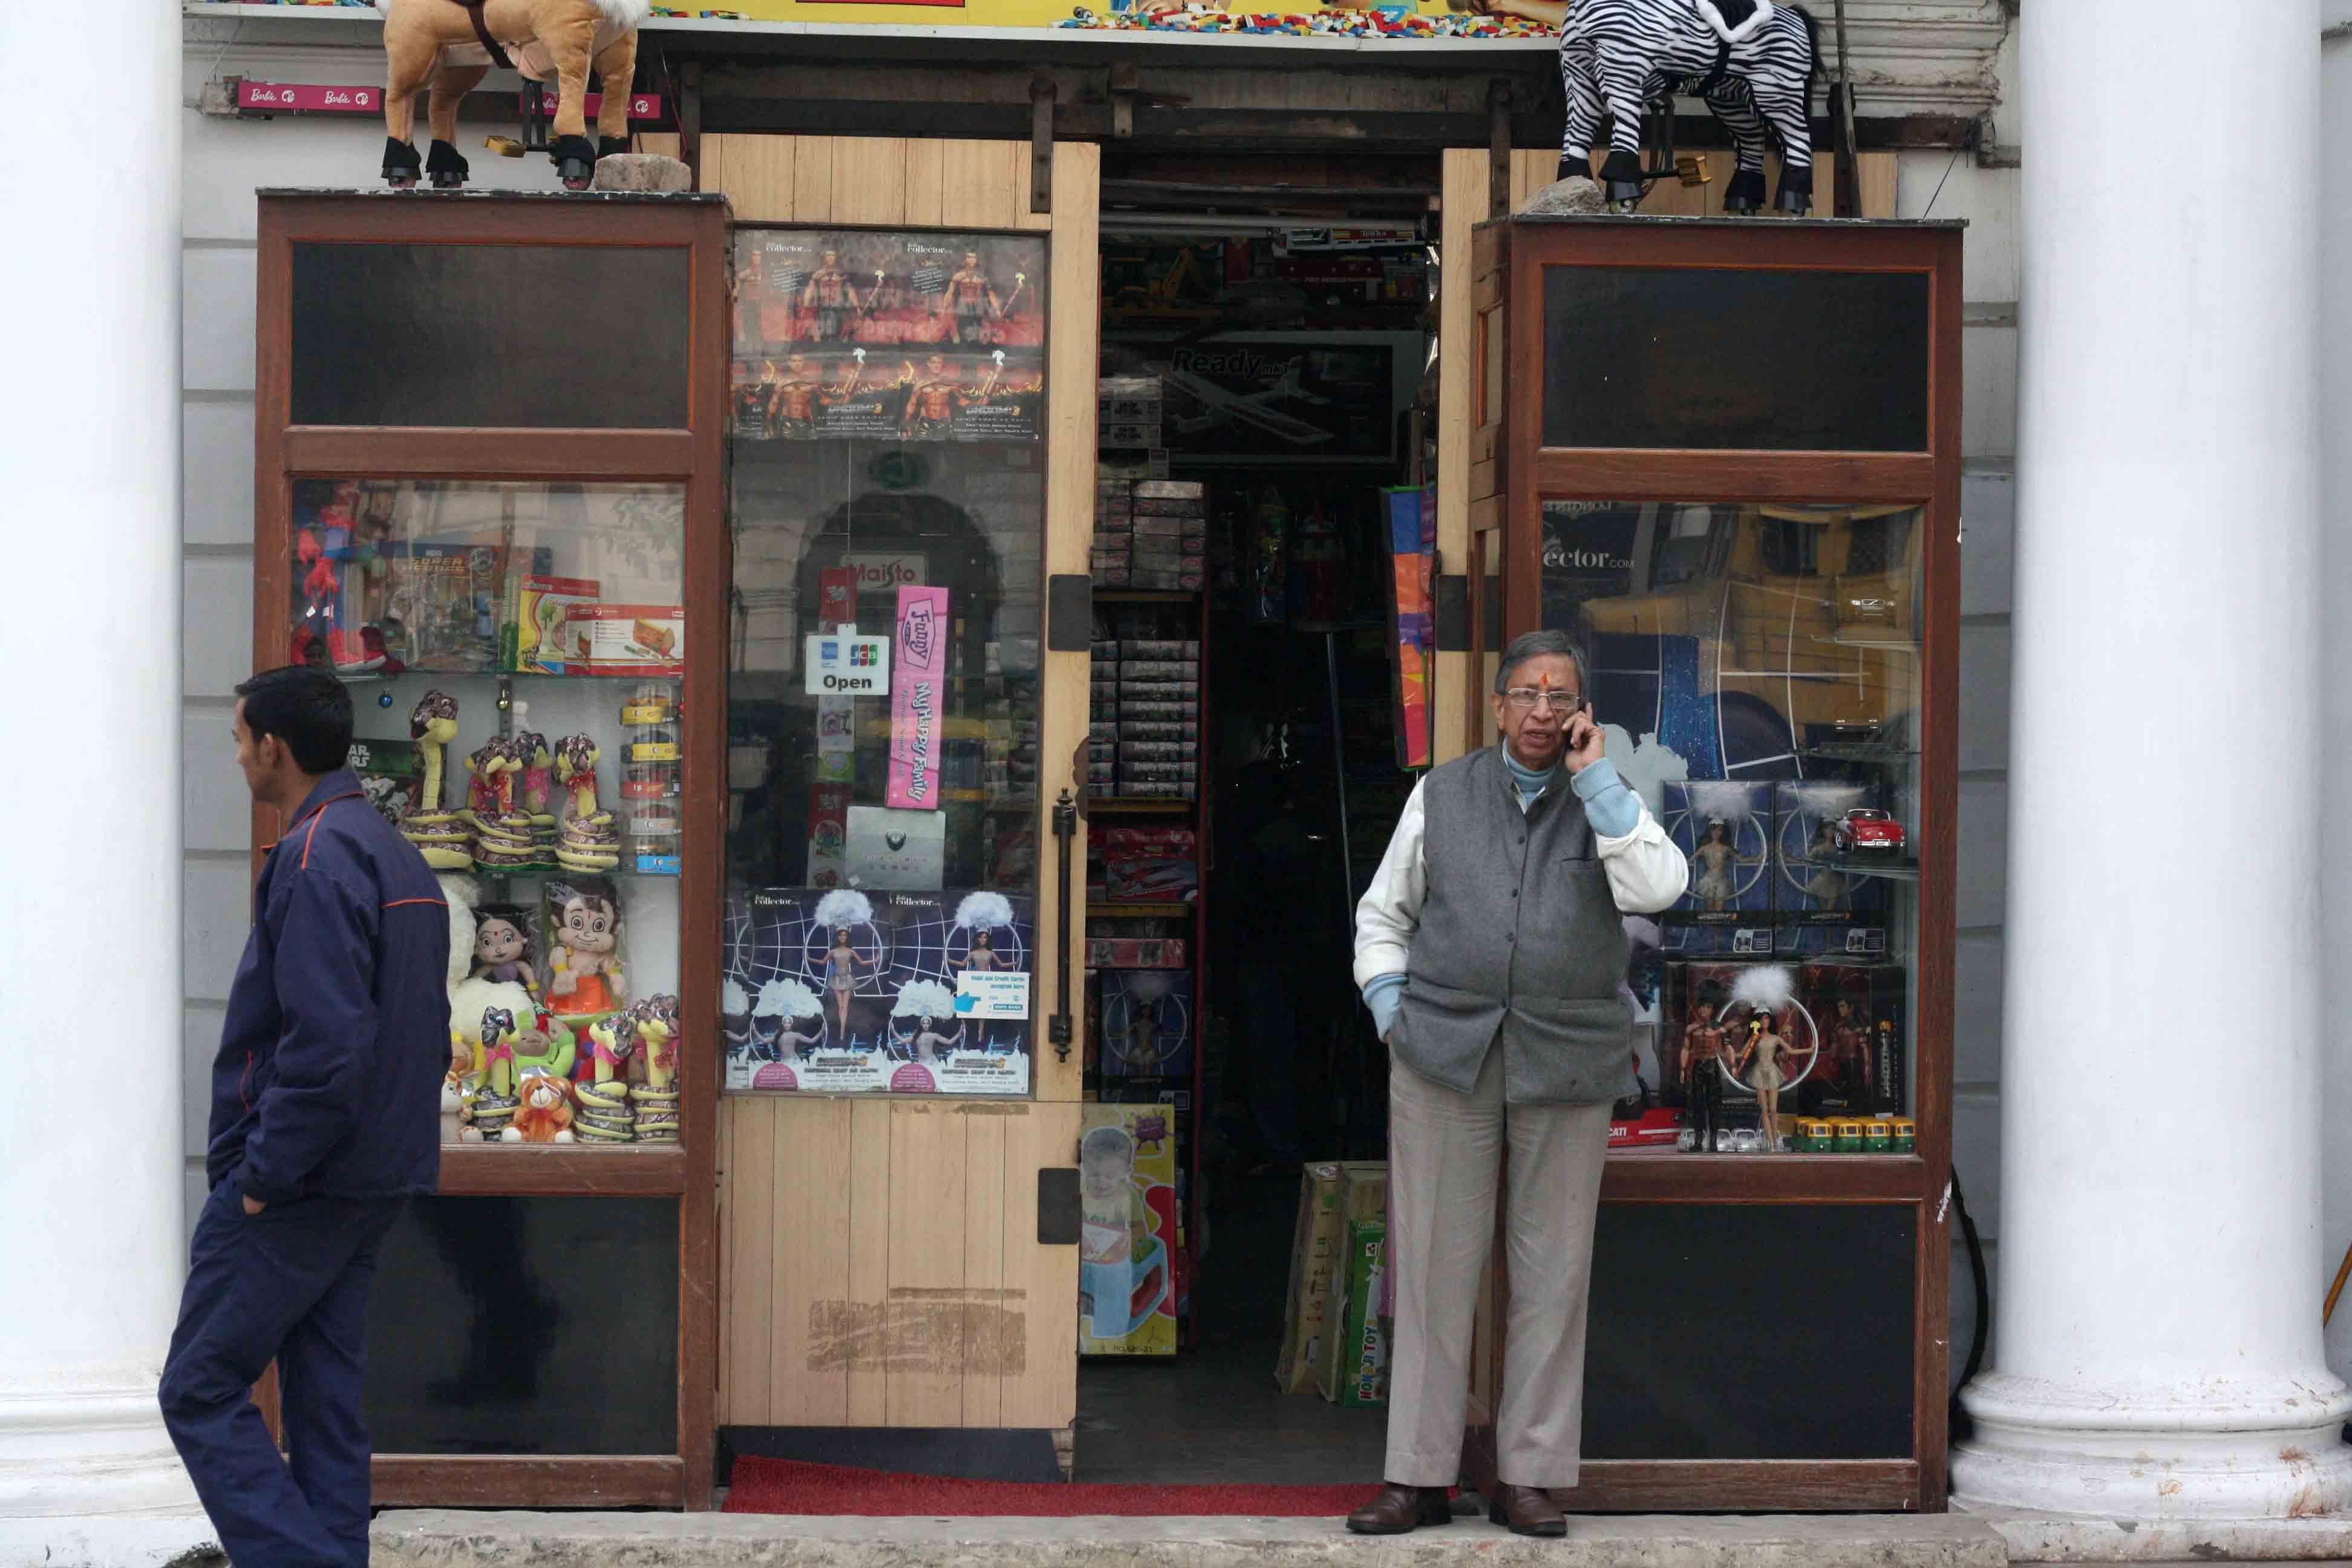 City Landmark – Ram Chander & Sons, Connaught Place